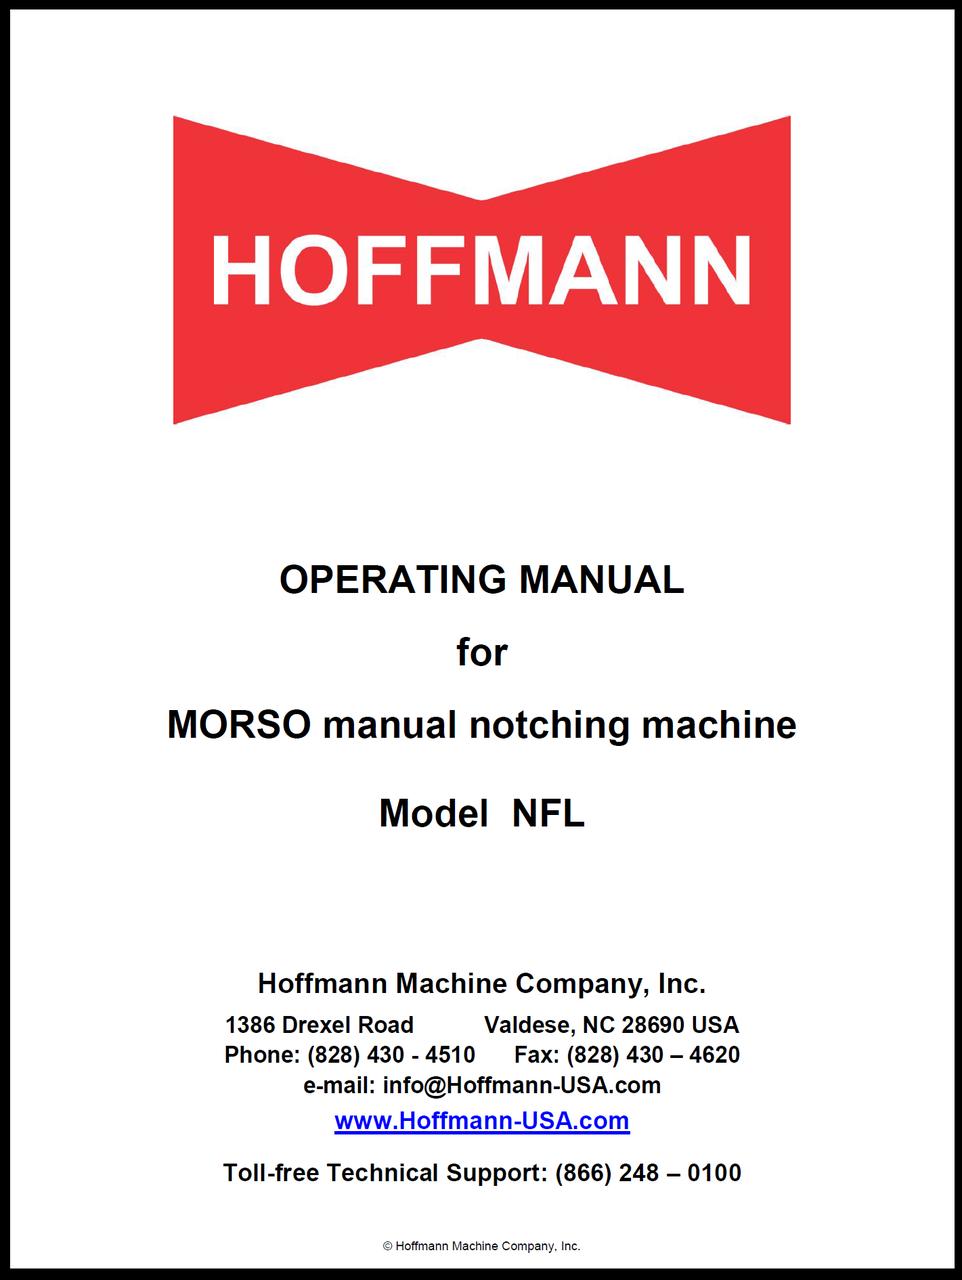 Operating Manual for Morso NFL